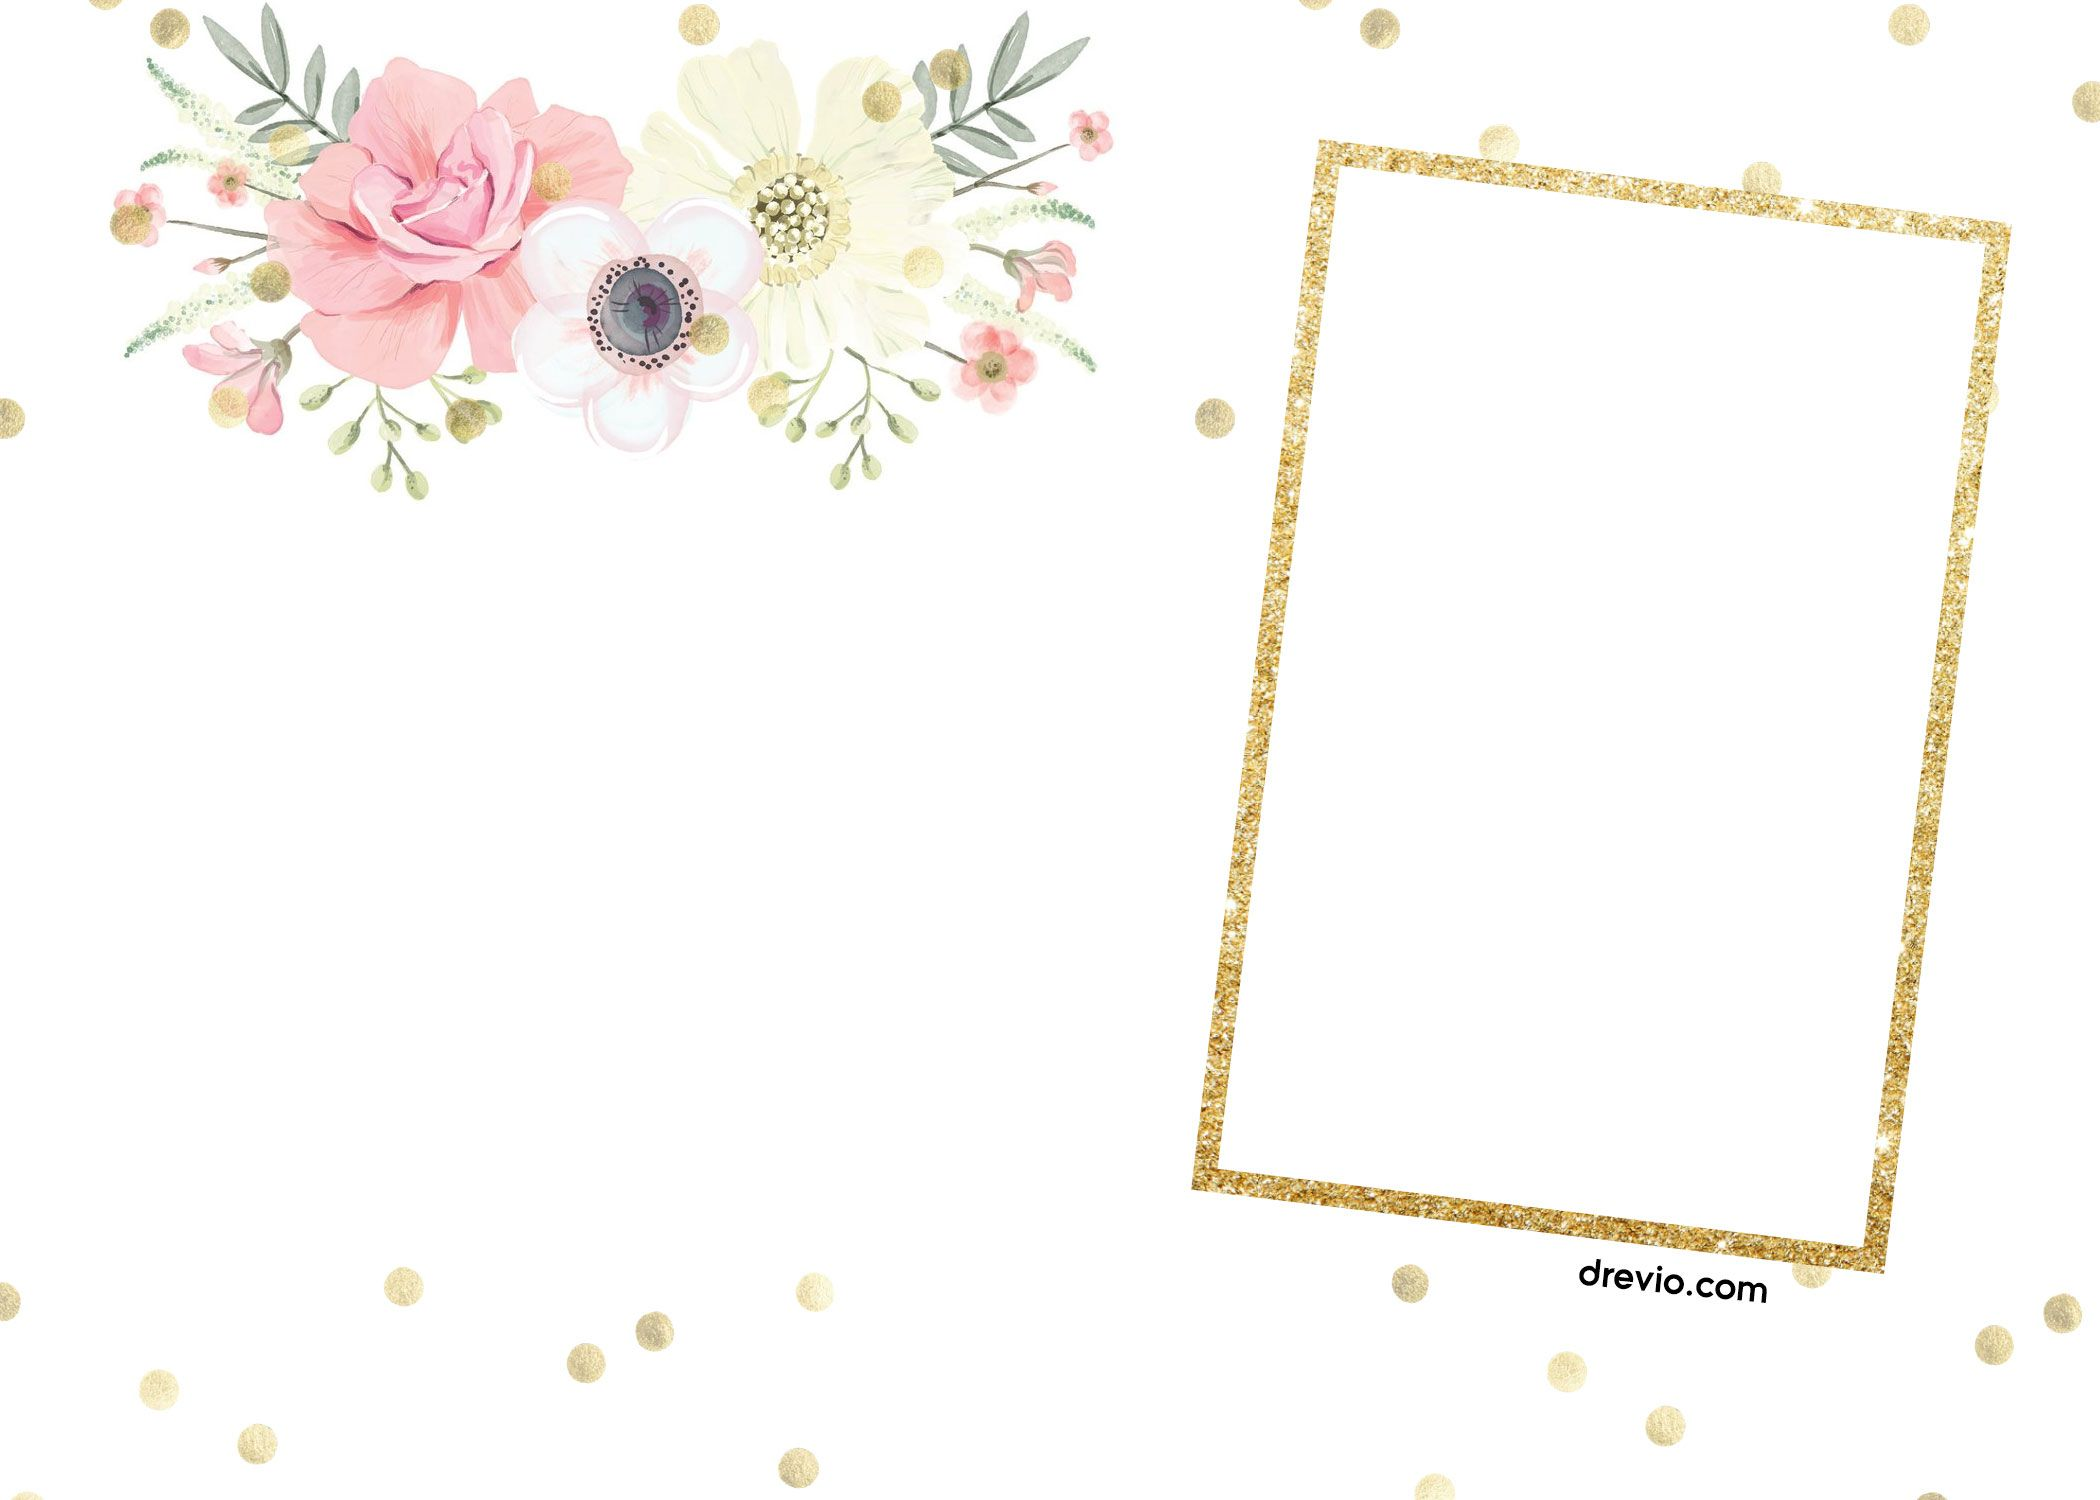 Dedication invites floral dedication invites First Communion invites glitter invite Minnie cross girl dedication Invitation